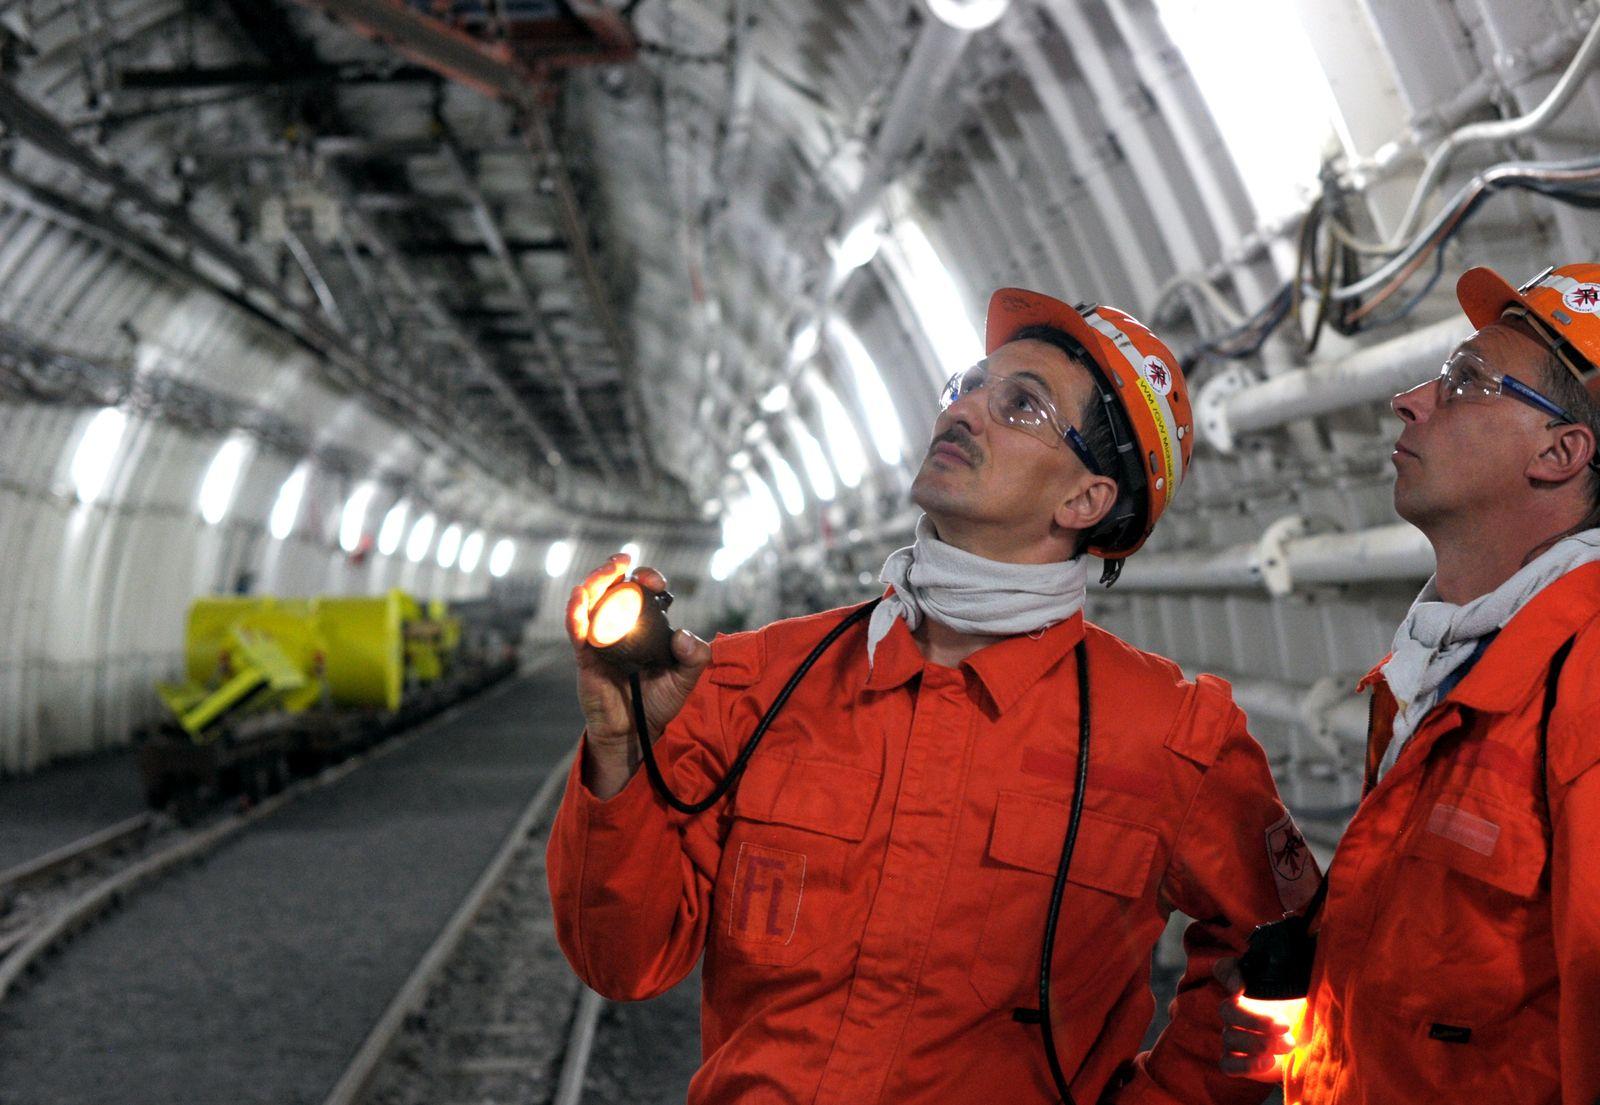 Bottroper Zeche eröffnet letztes Bergbau-Großprojekt